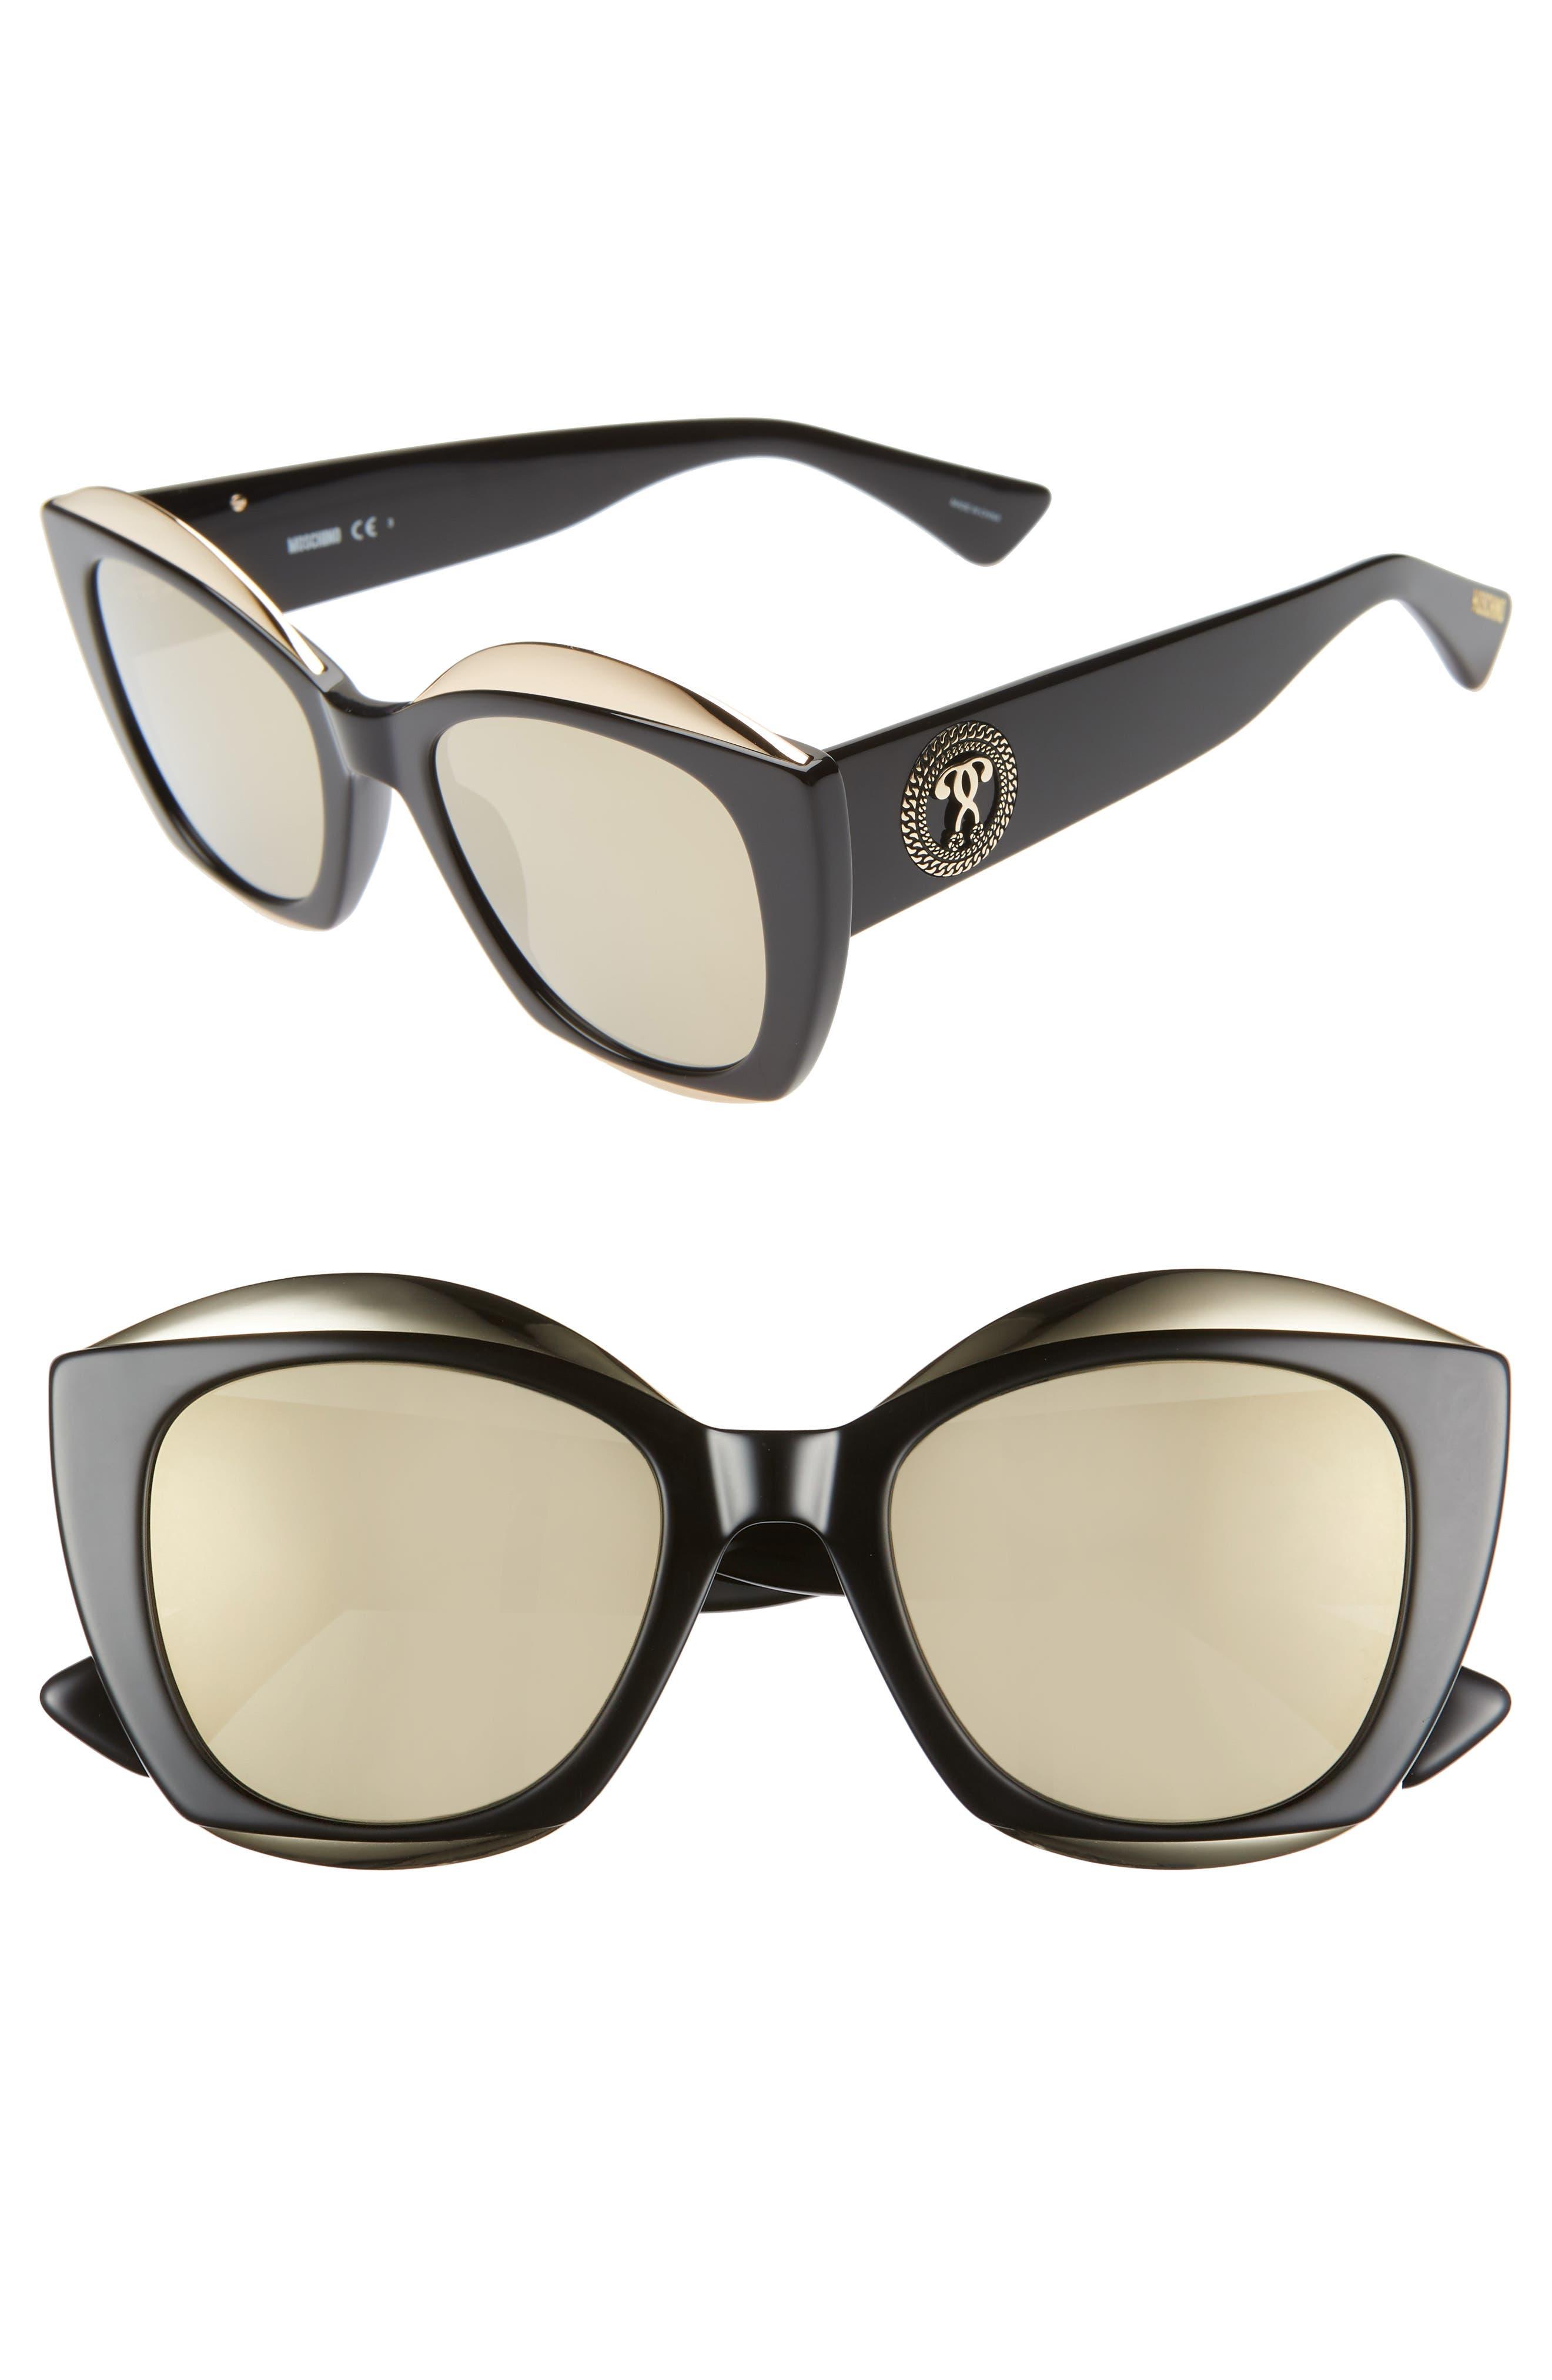 MOSCHINO, 52mm Cat Eye Sunglasses, Main thumbnail 1, color, BLACK